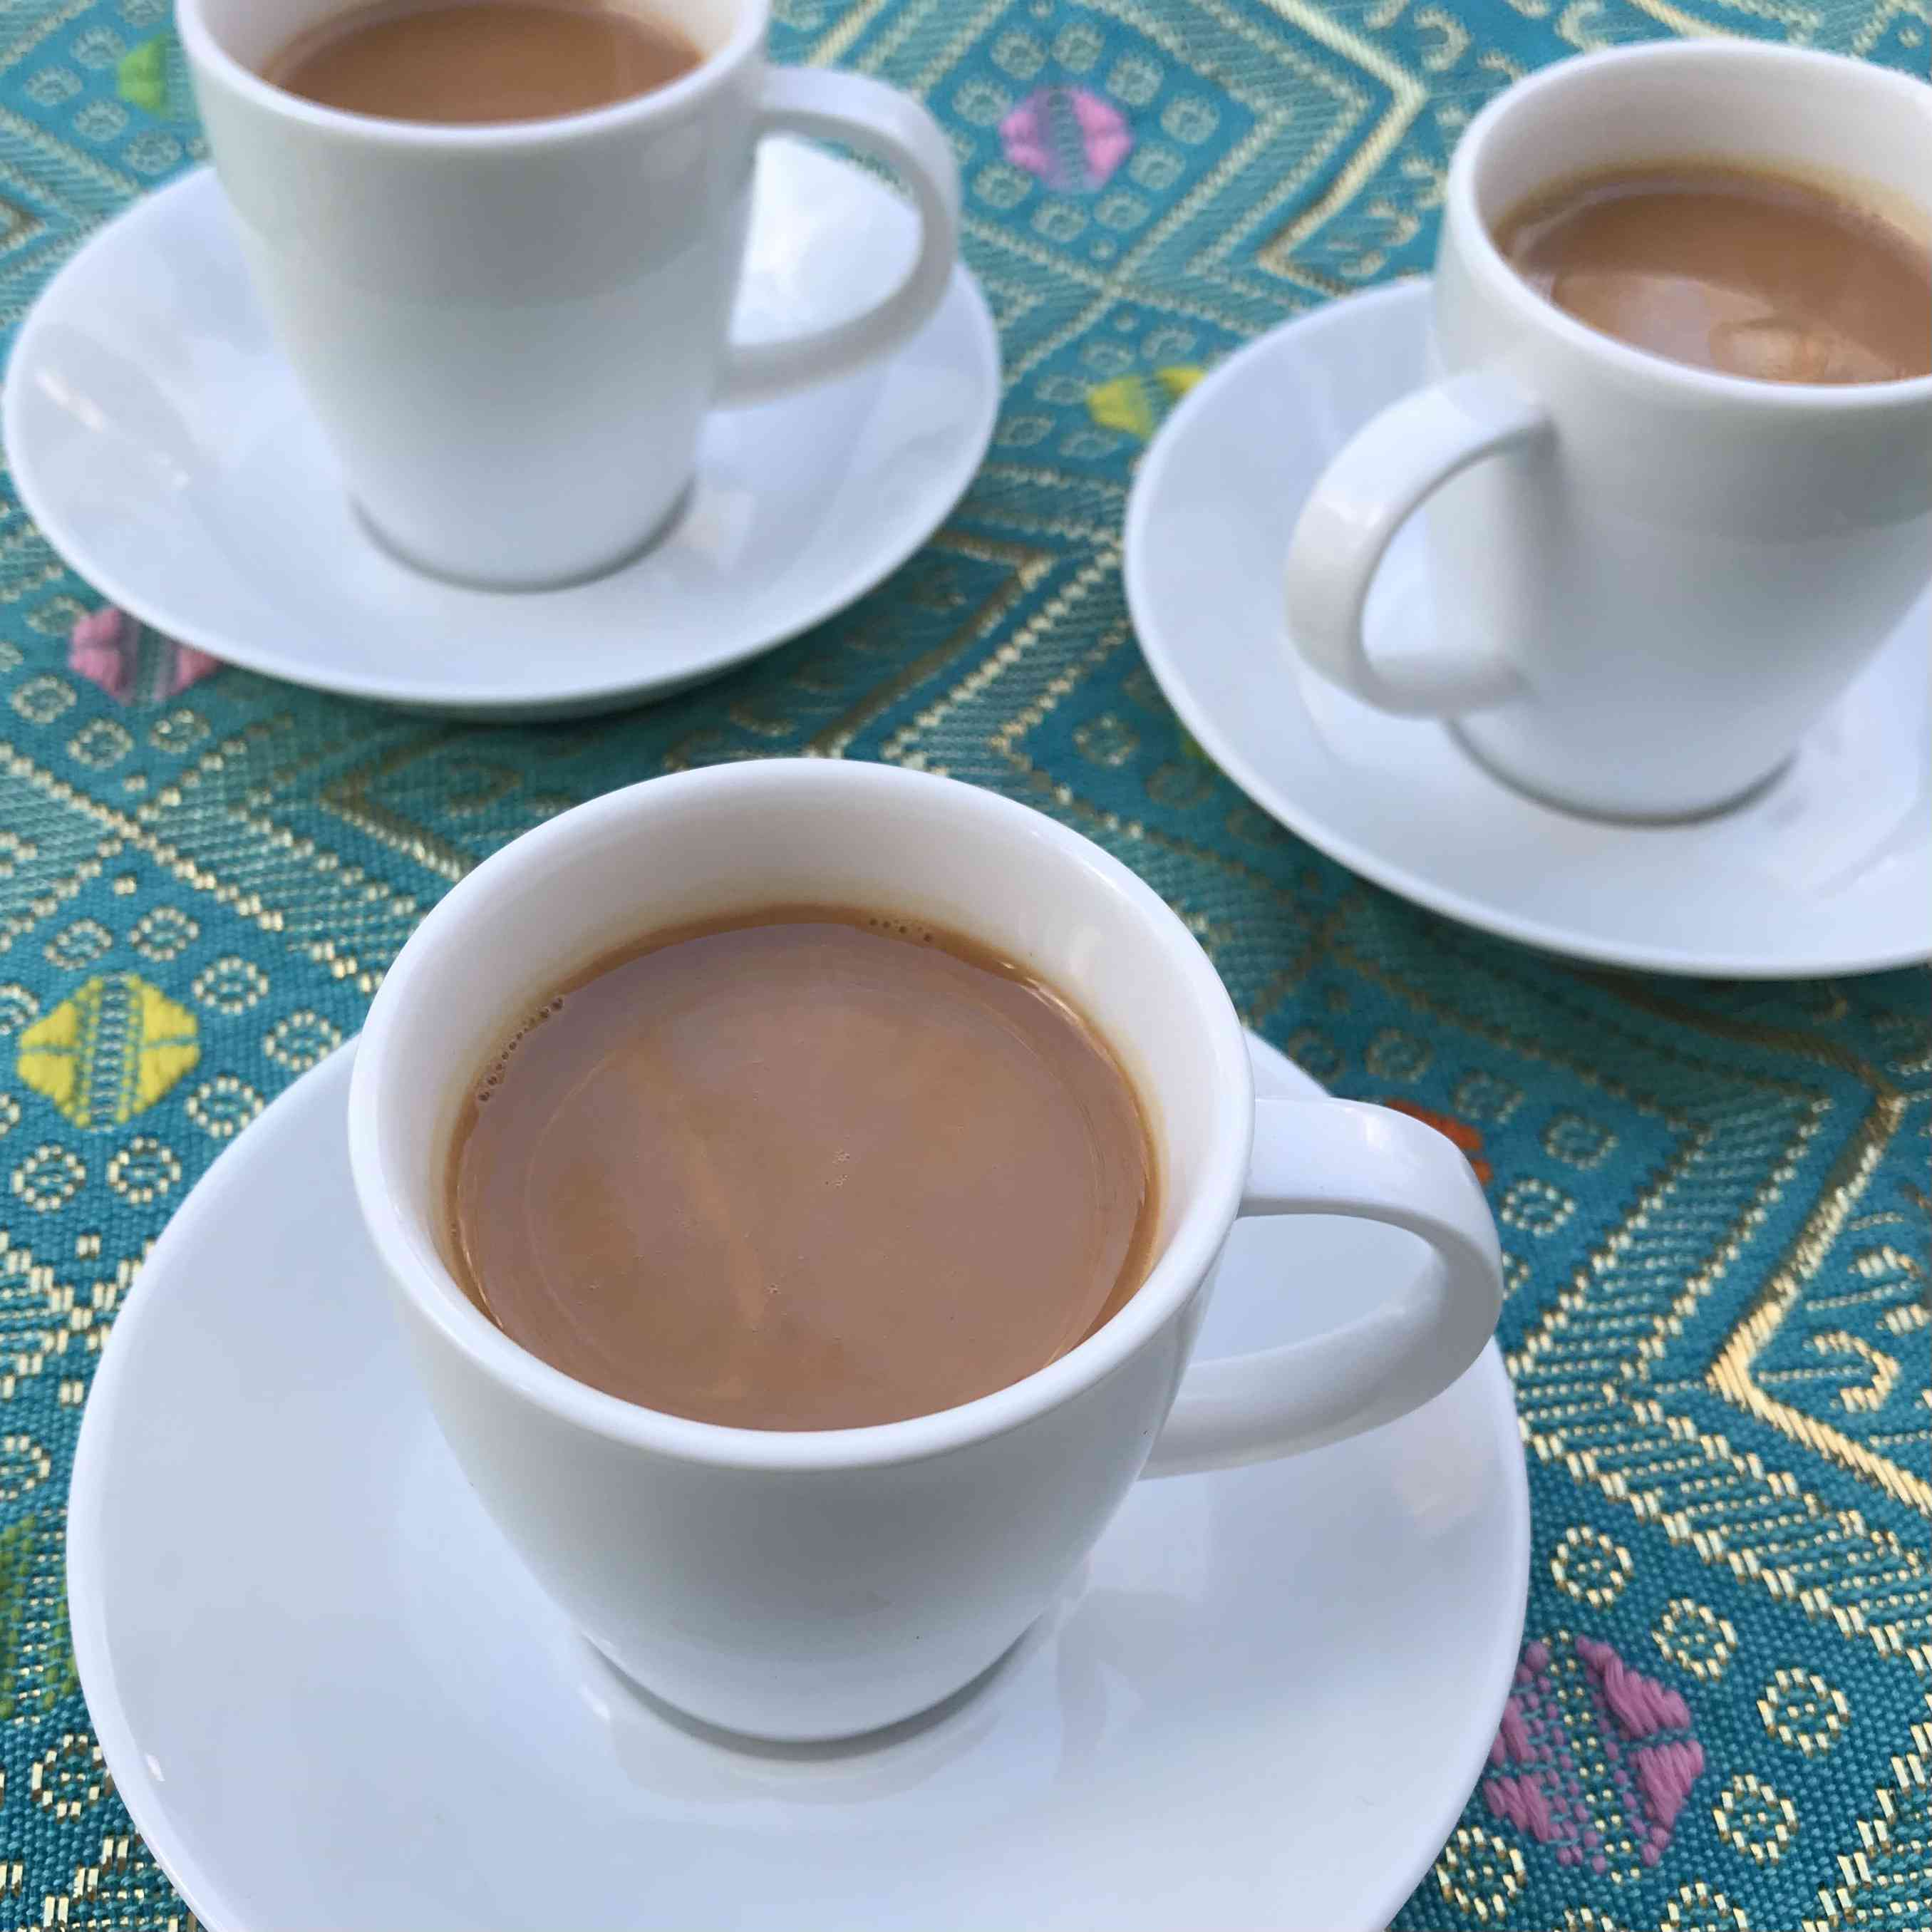 Hong Kong Milk Tea Tester Image